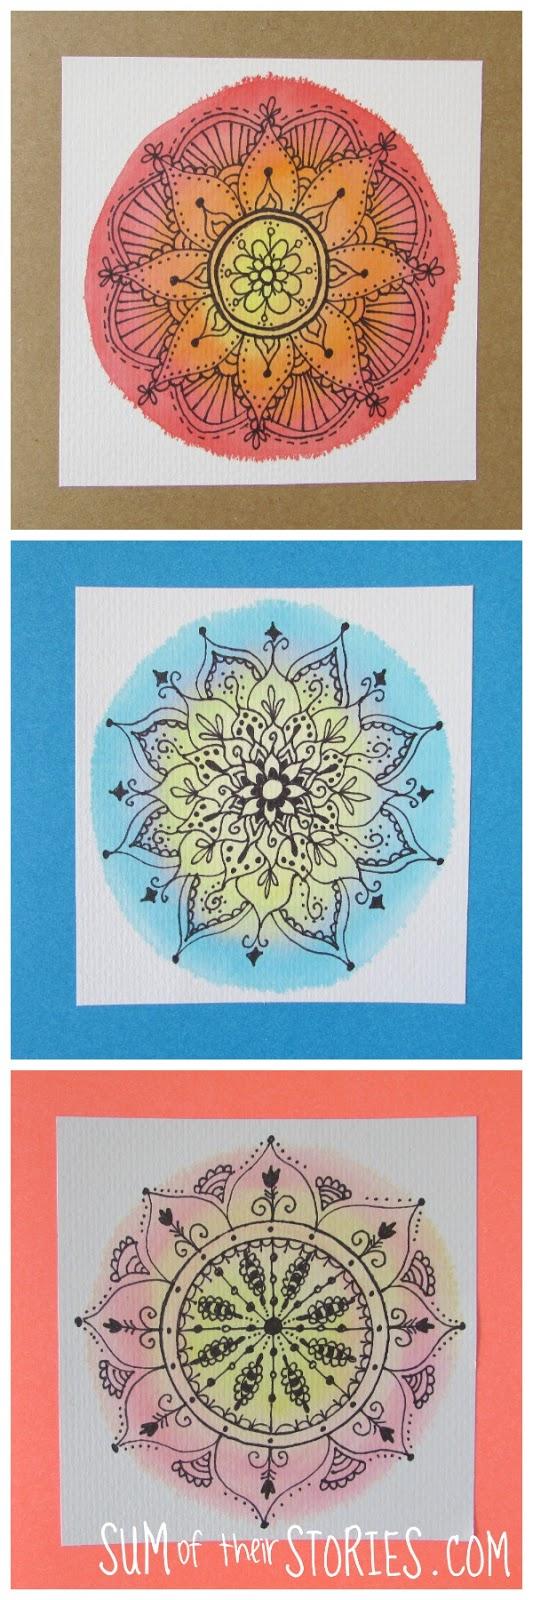 fake Watercolour and doodle mandala cards